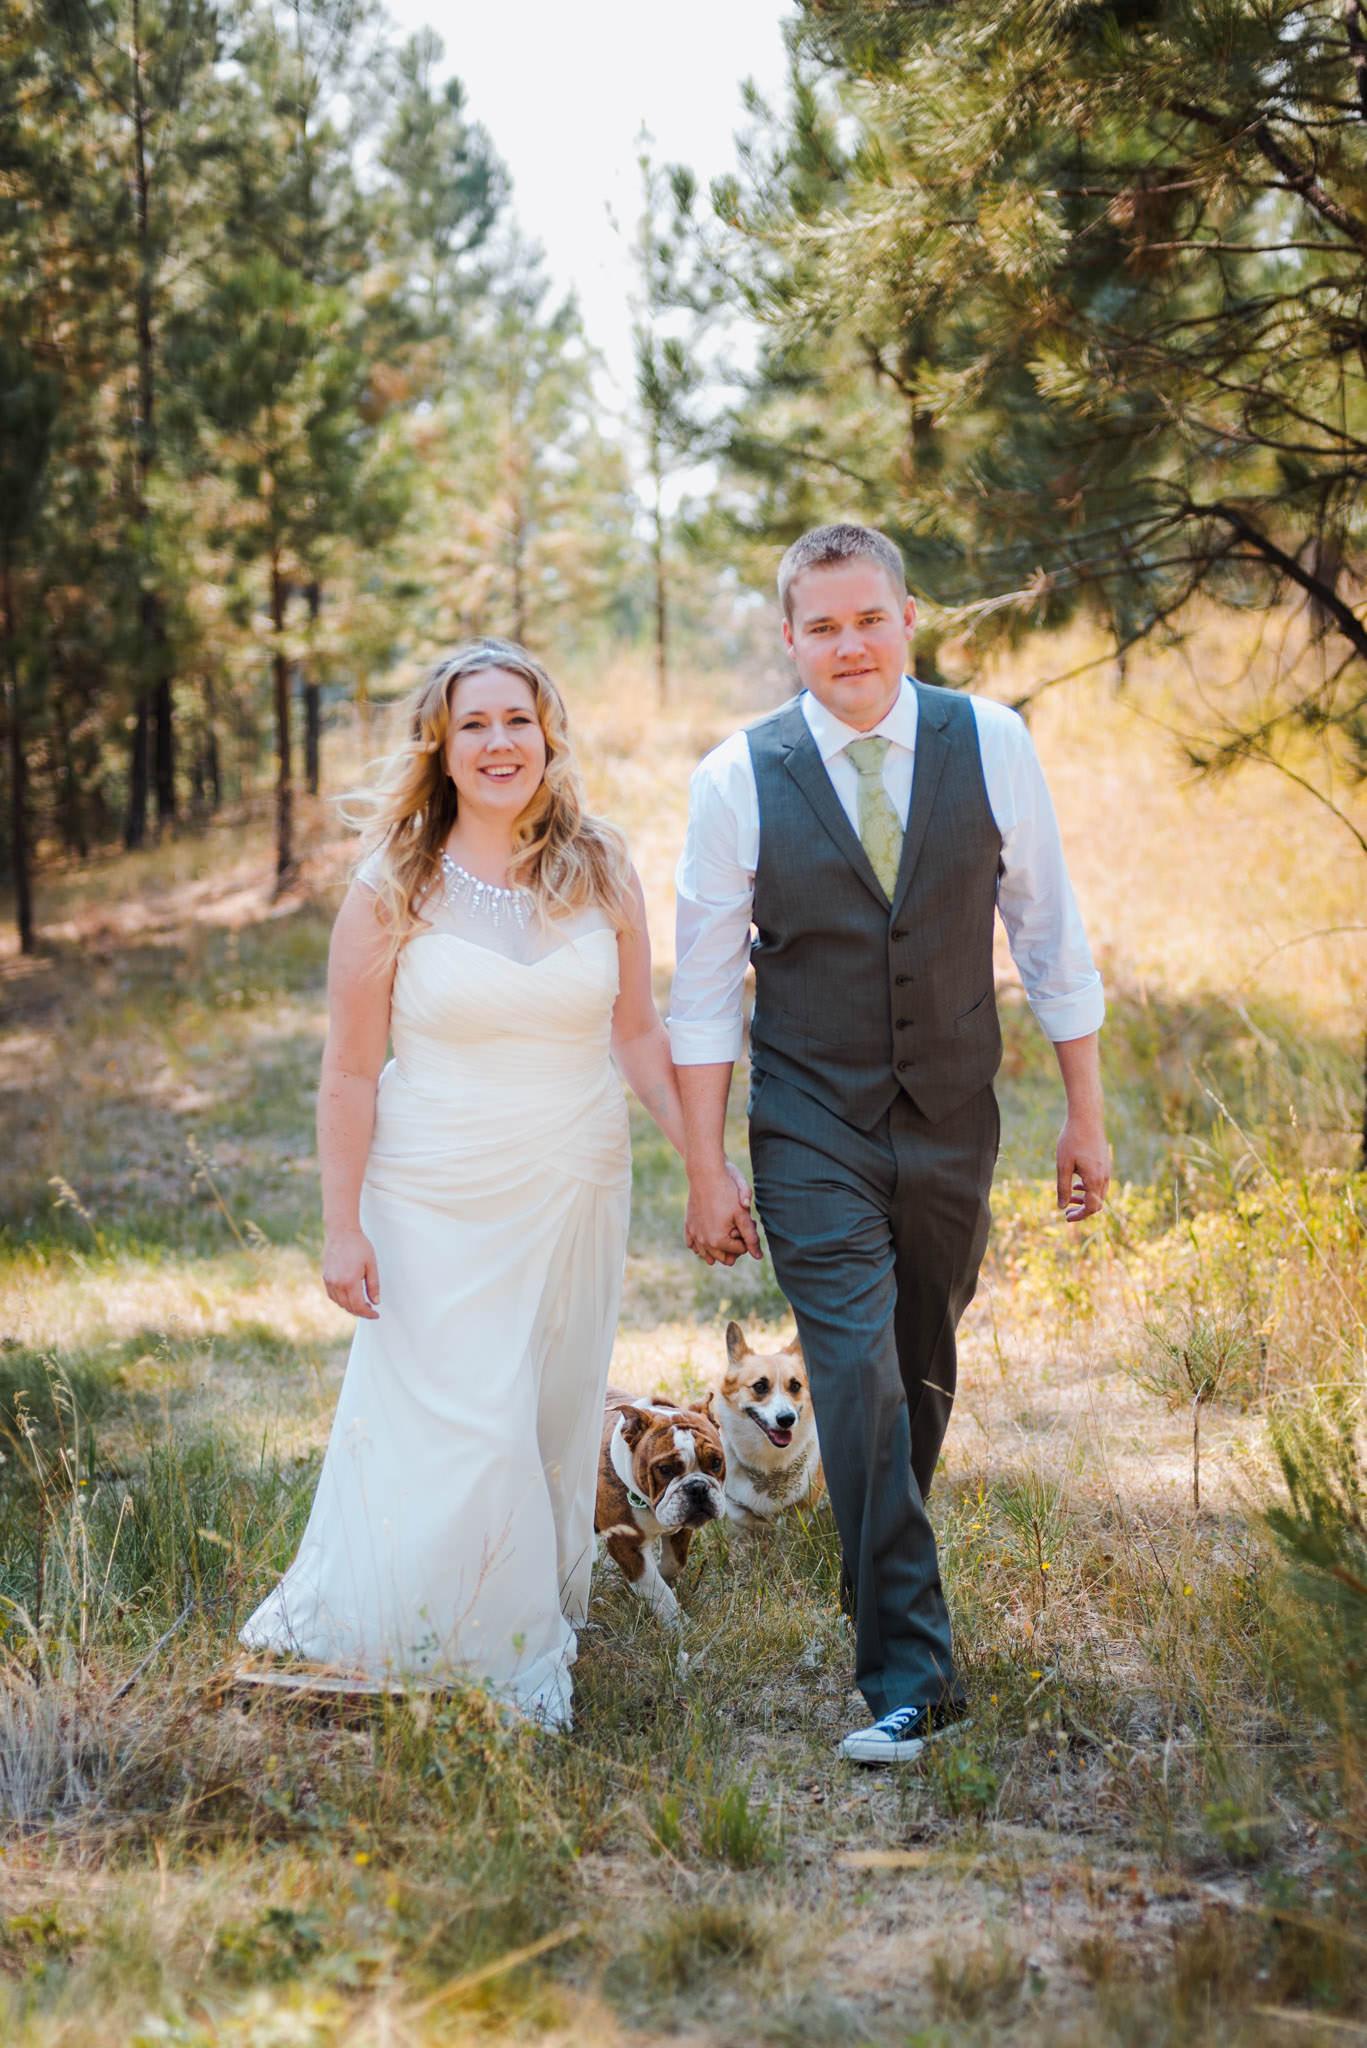 Zilla Photography Wild Adventure Mountain Wedding Dogs